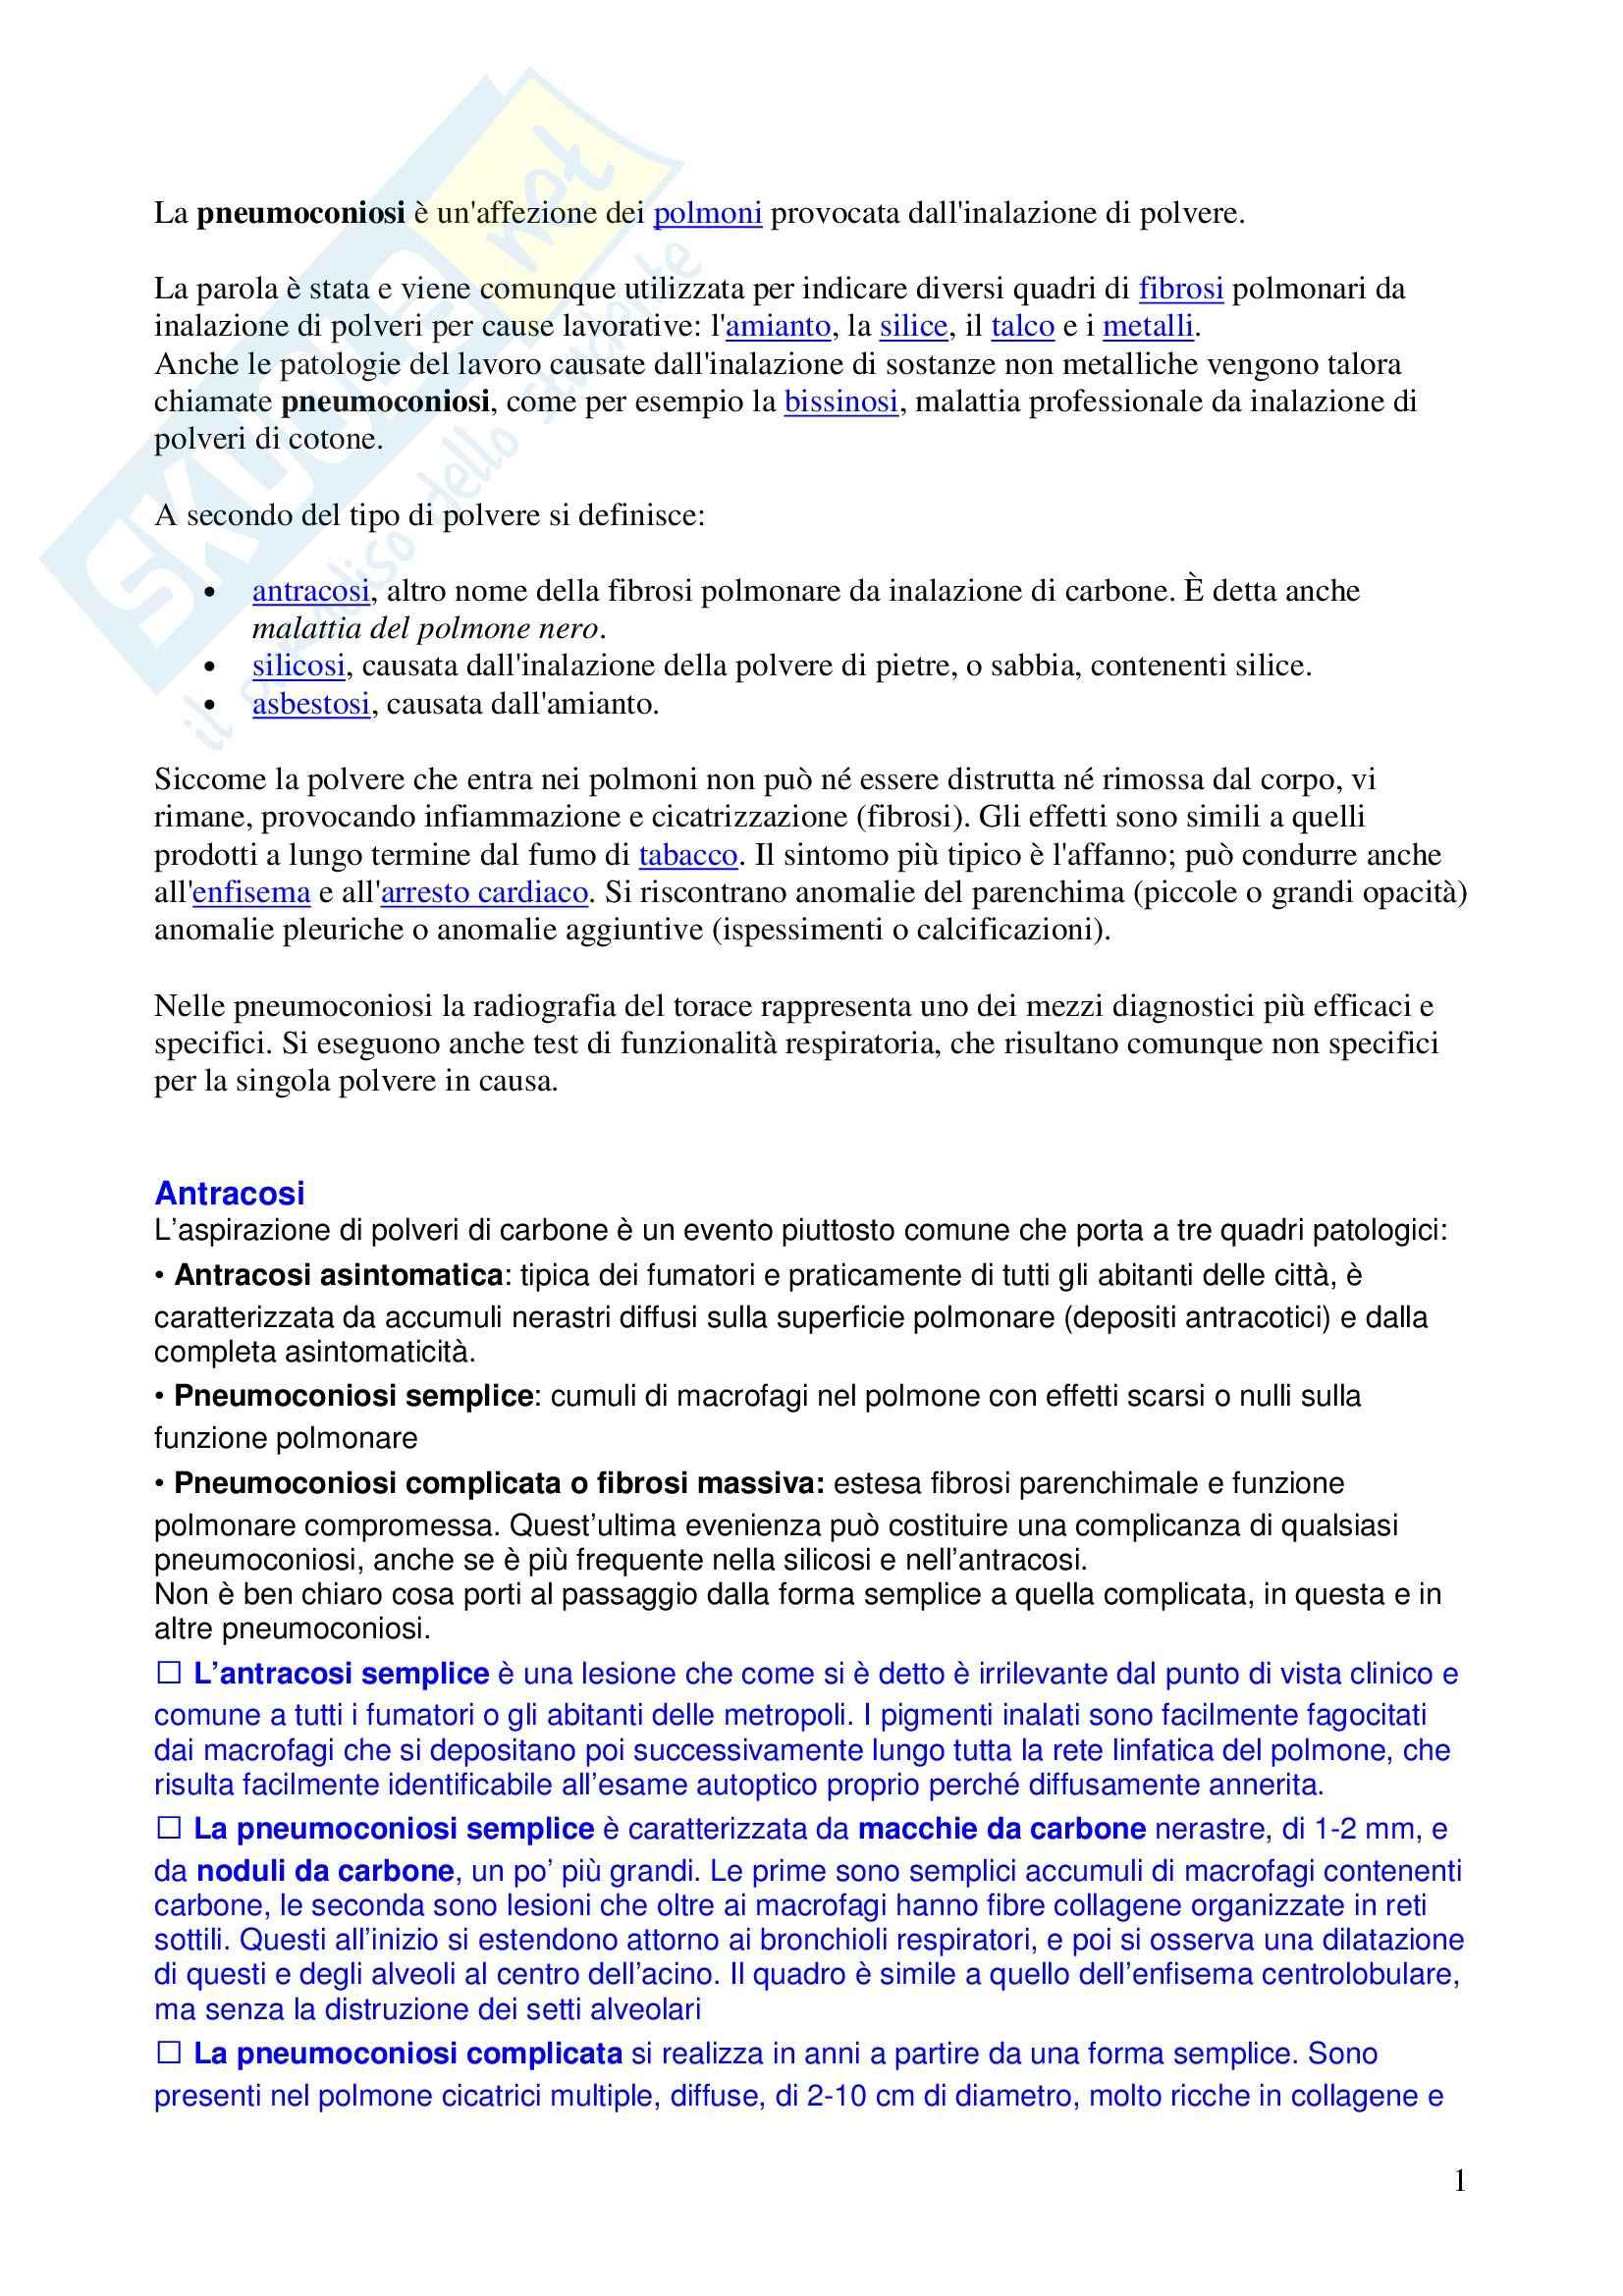 Anatomia patologica - pneumoconiosi